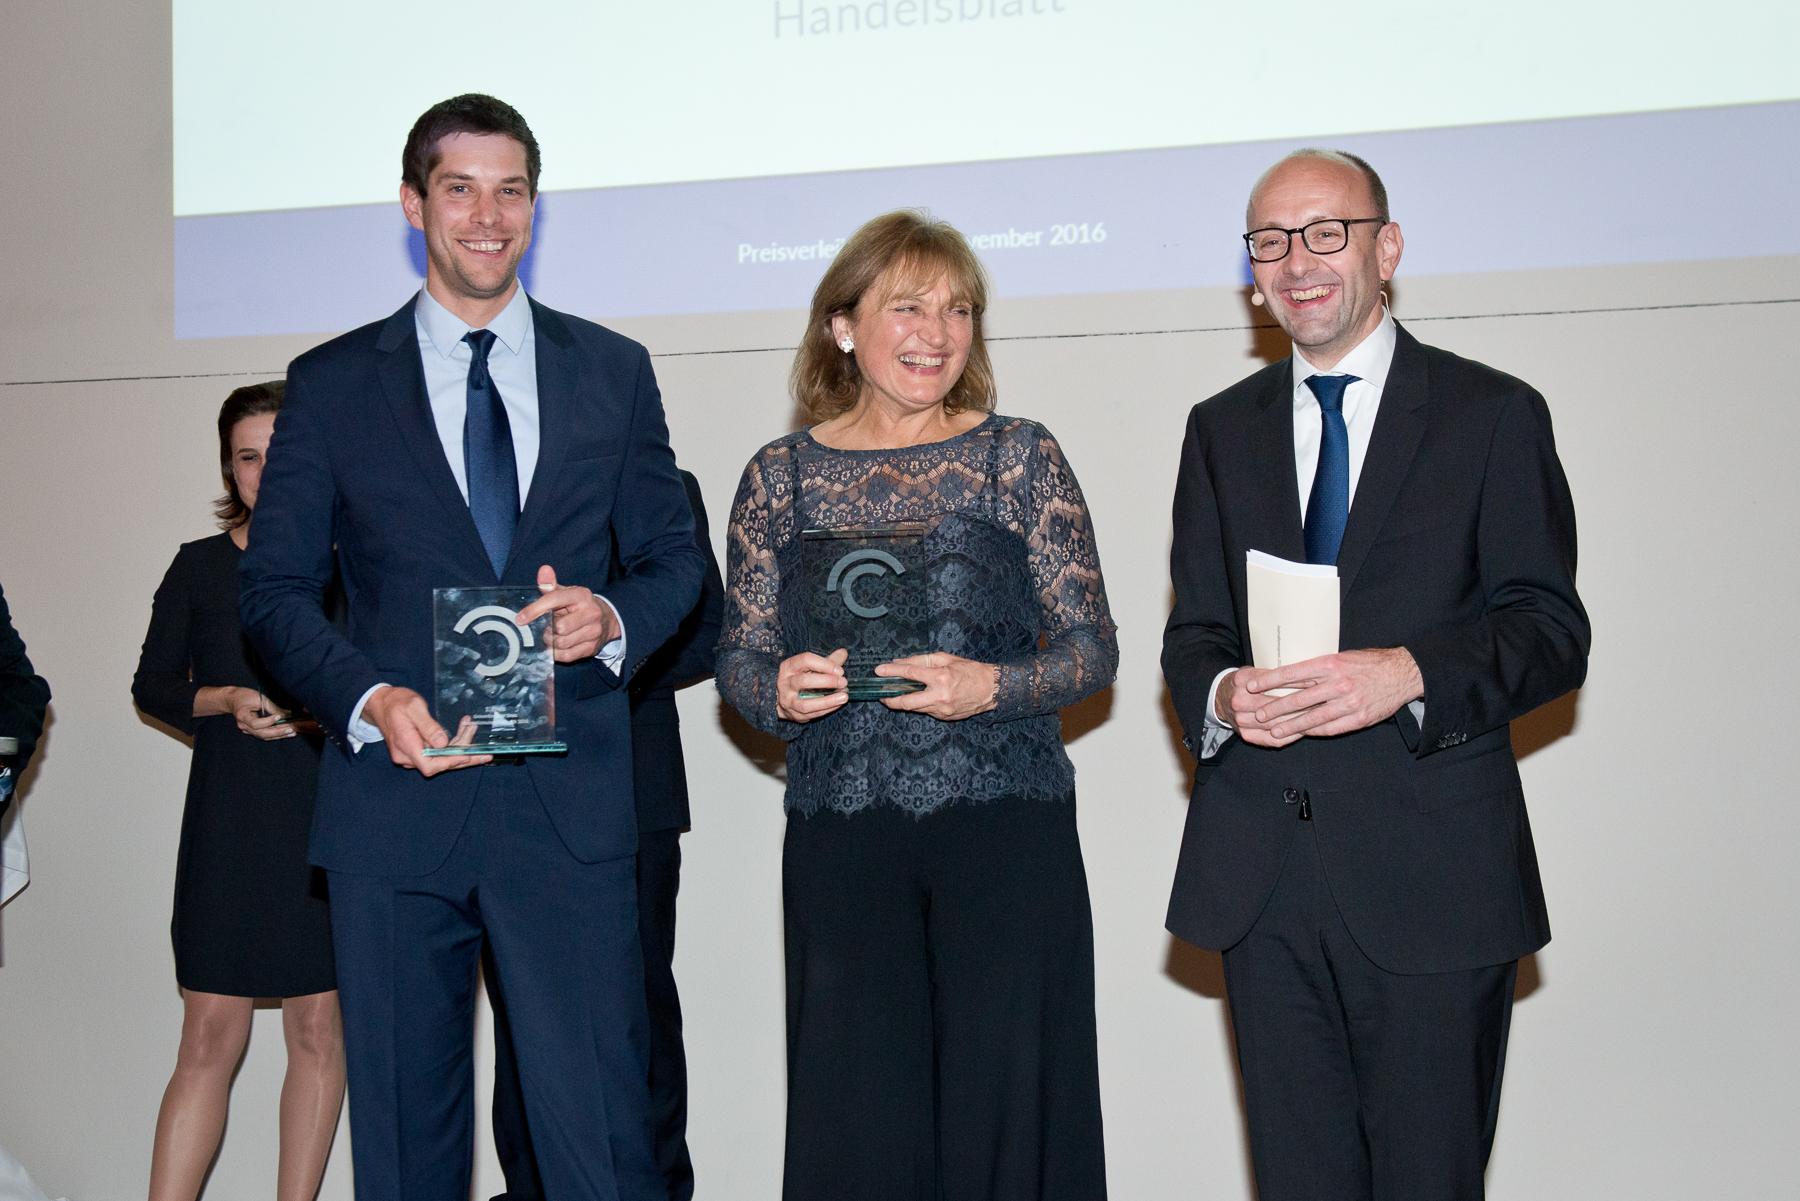 Andreas Dörnfelder (1. Preis), Gertrud Hussla (1. Preis), Prof. Dr. Lucas F. Flöther